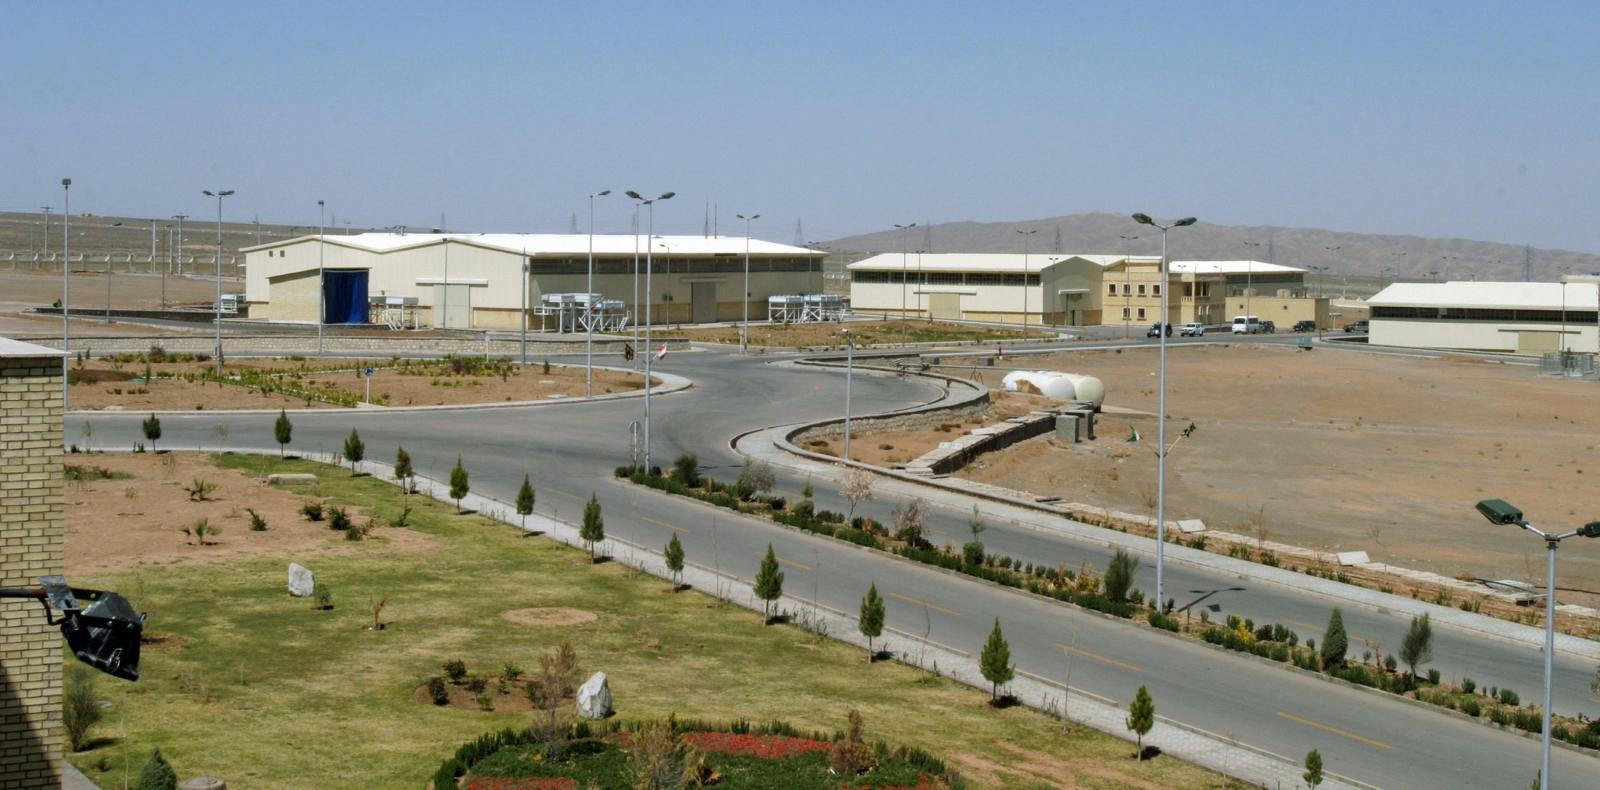 Natanz nuclear facility in Iran